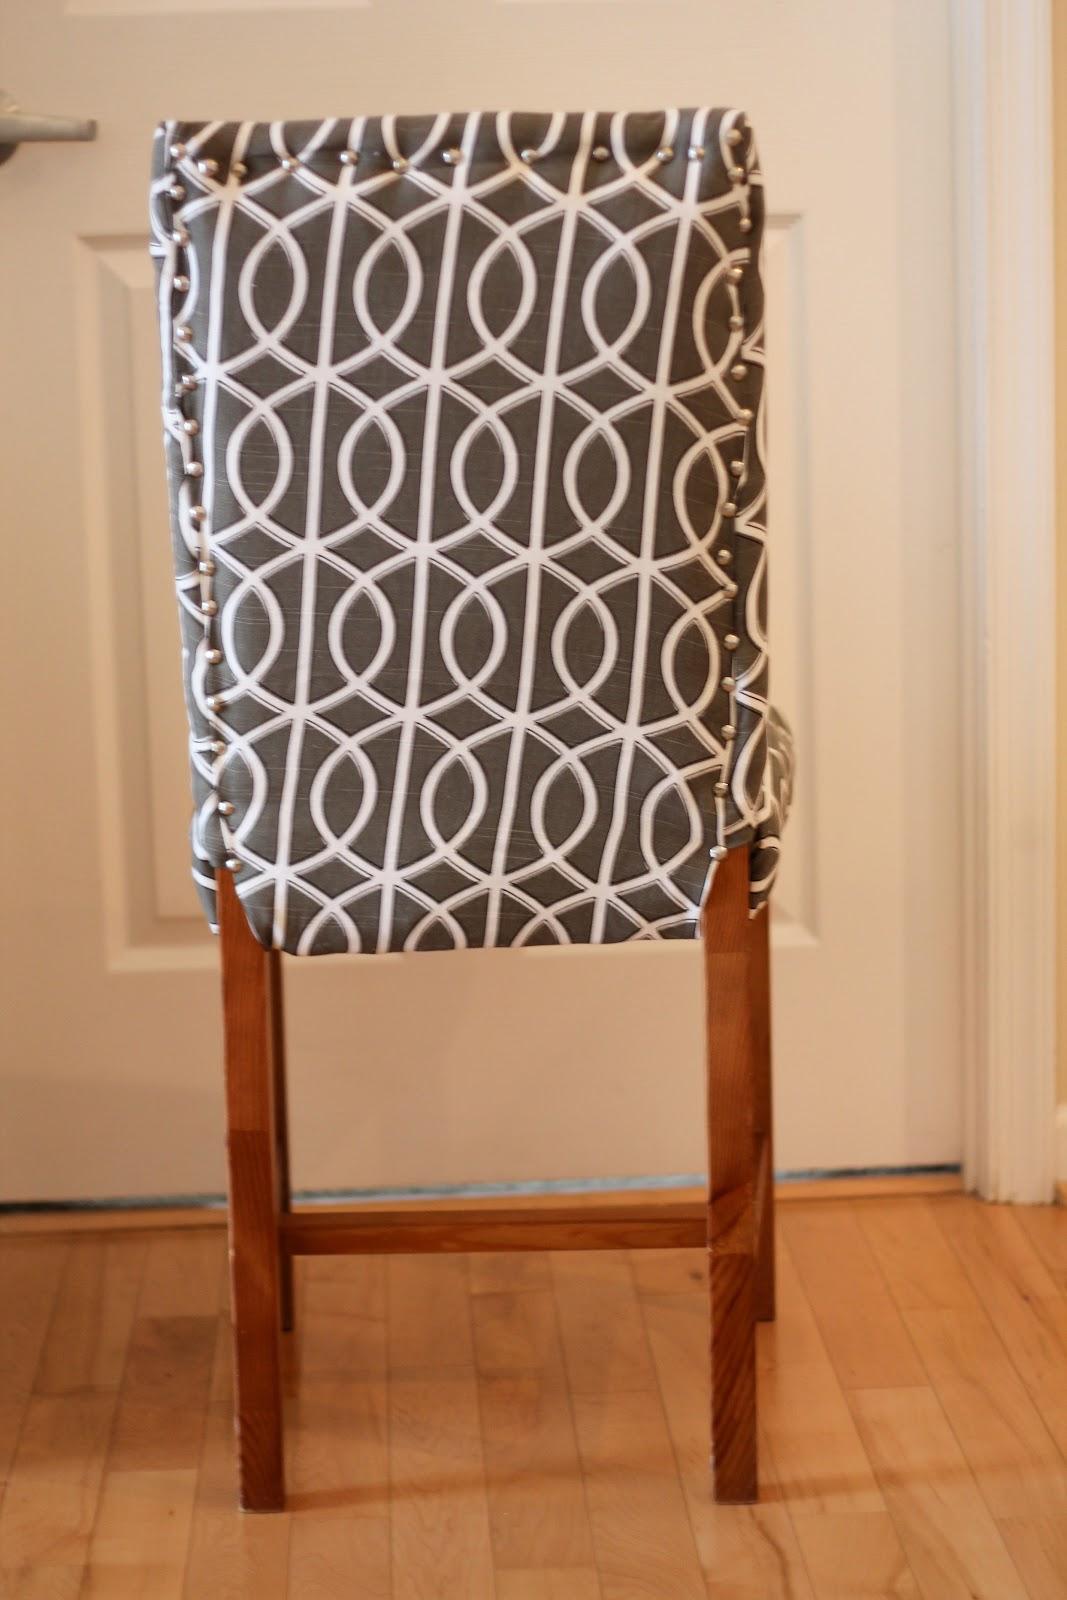 wednesday perk diy upholstering ikea upholstered kitchen chairs Style Wednesday Perk DIY Upholstering An Ikea Dining Chair